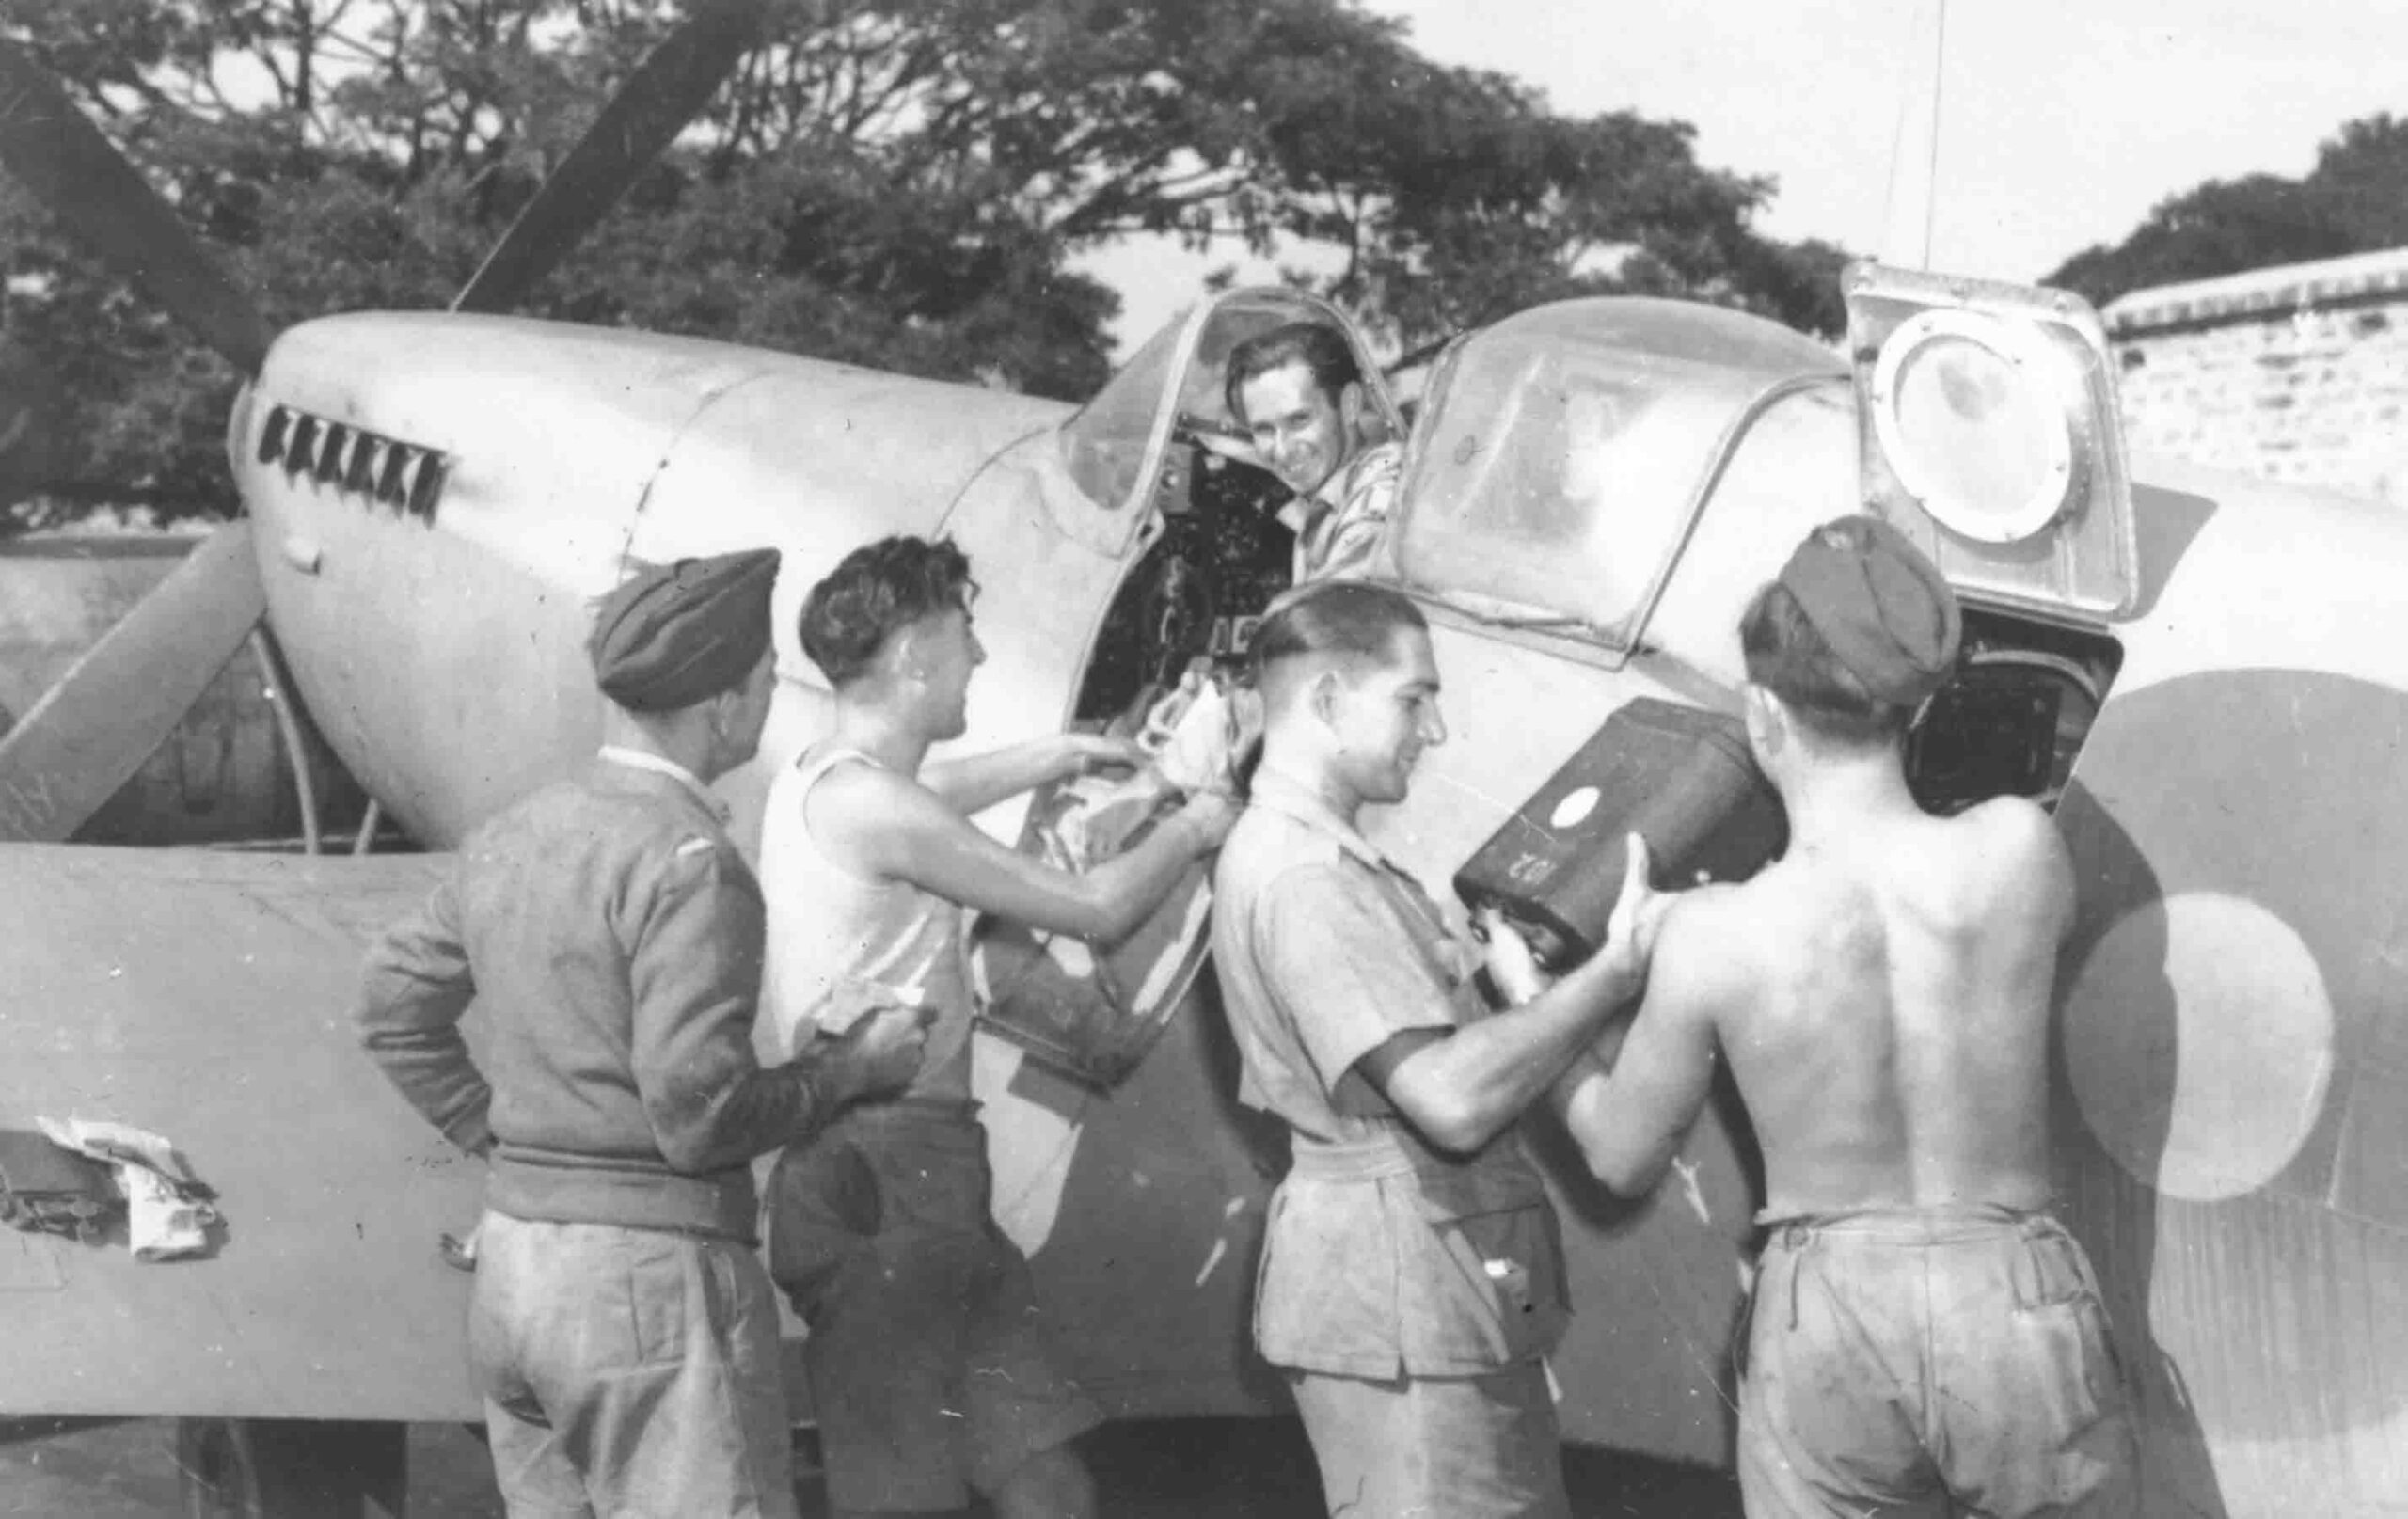 Unloading camera from Supermarine Spitfire PR.XI of No. 681 Squadron, Alipore, December 1944 (RAFM PC94/158/002)